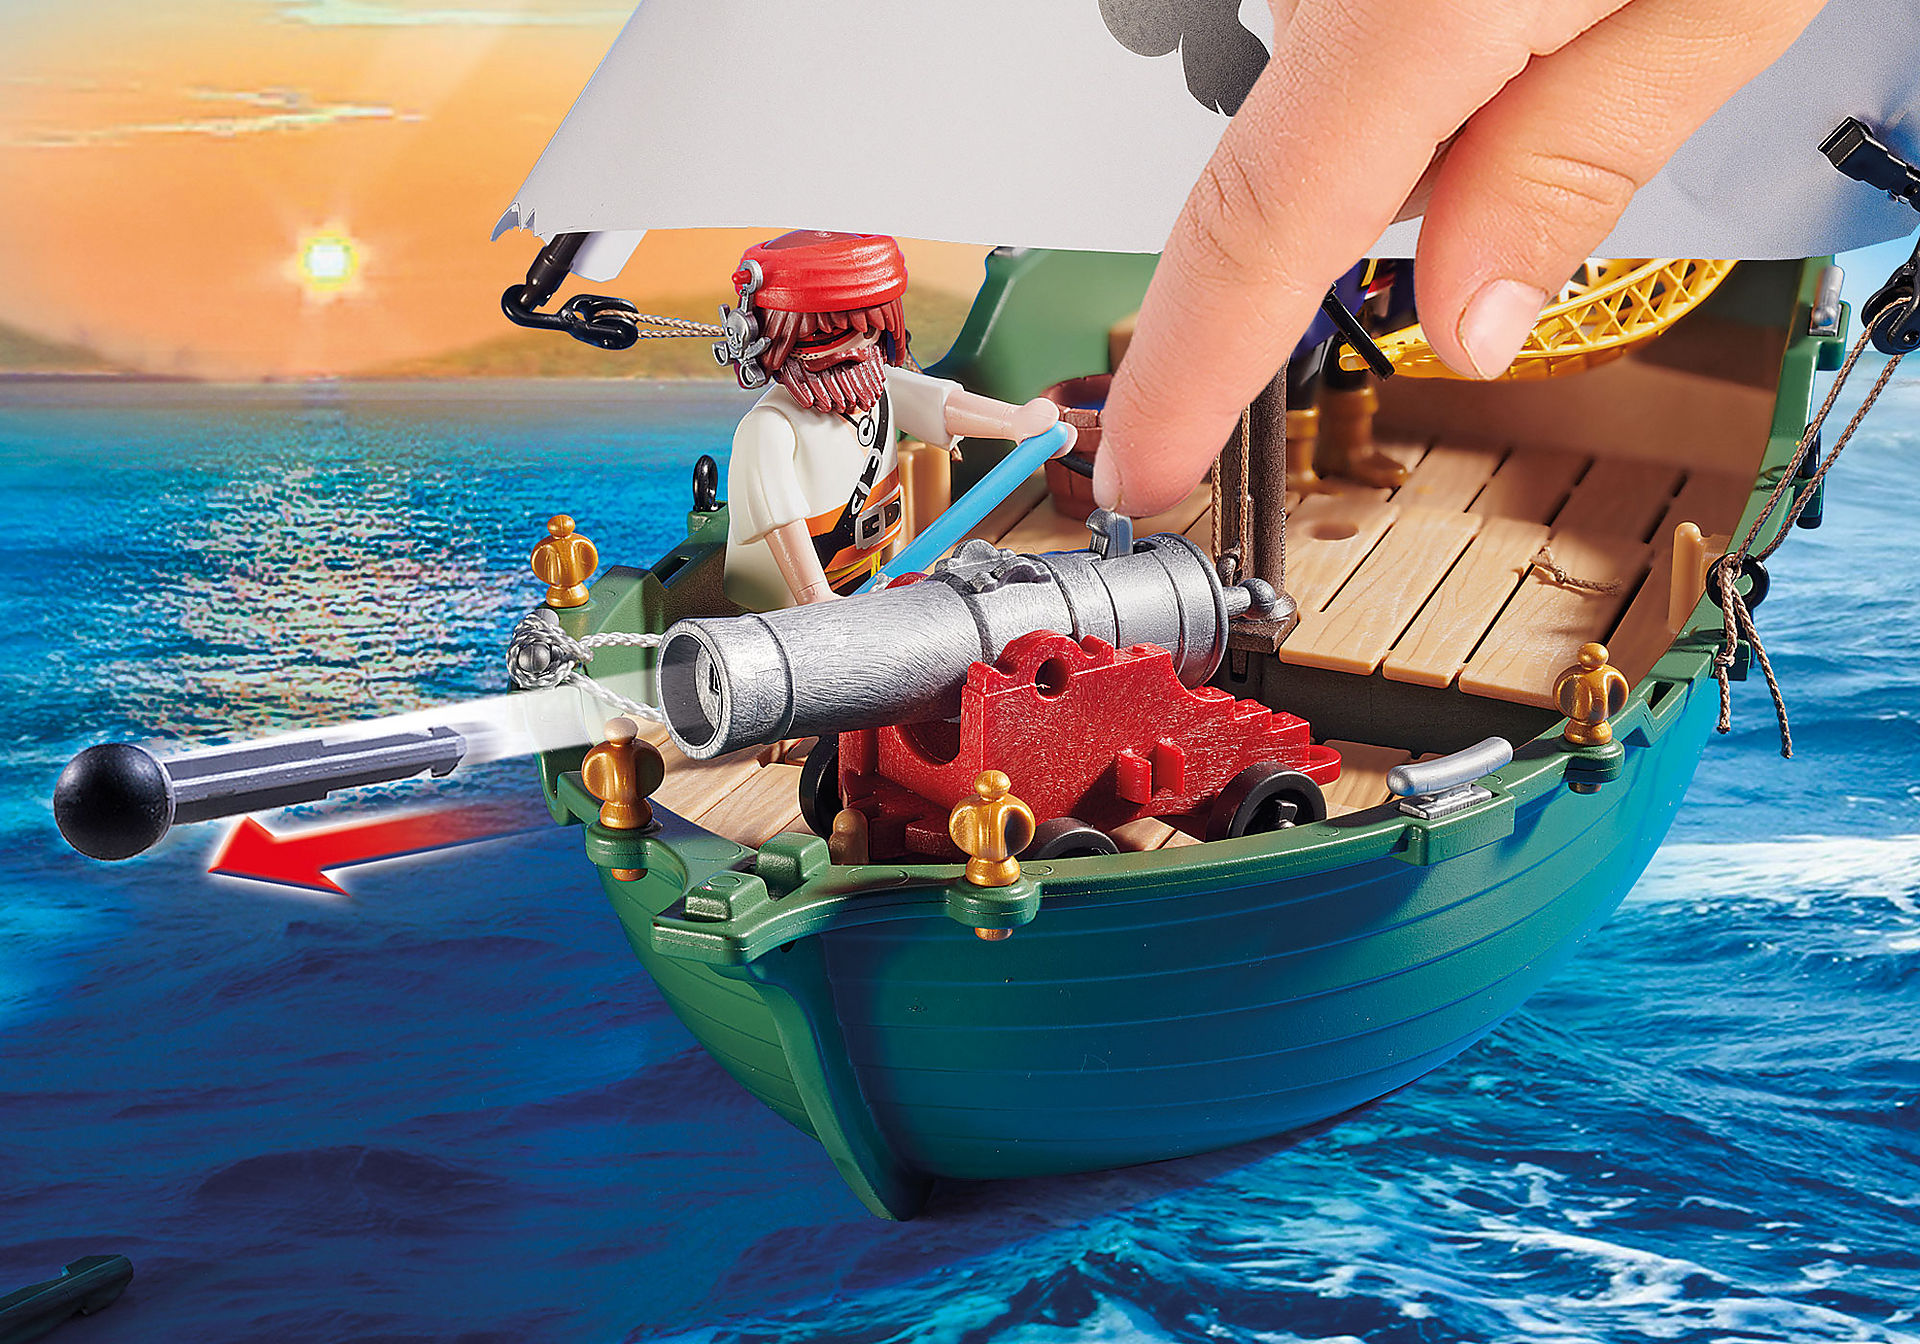 70151 Barco Pirata con motor submarino zoom image5